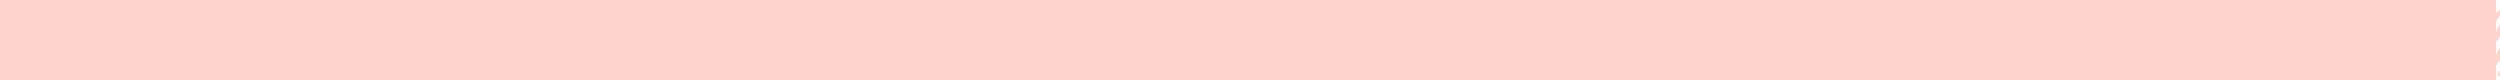 Garlic Friday Design Pattern Peach.png